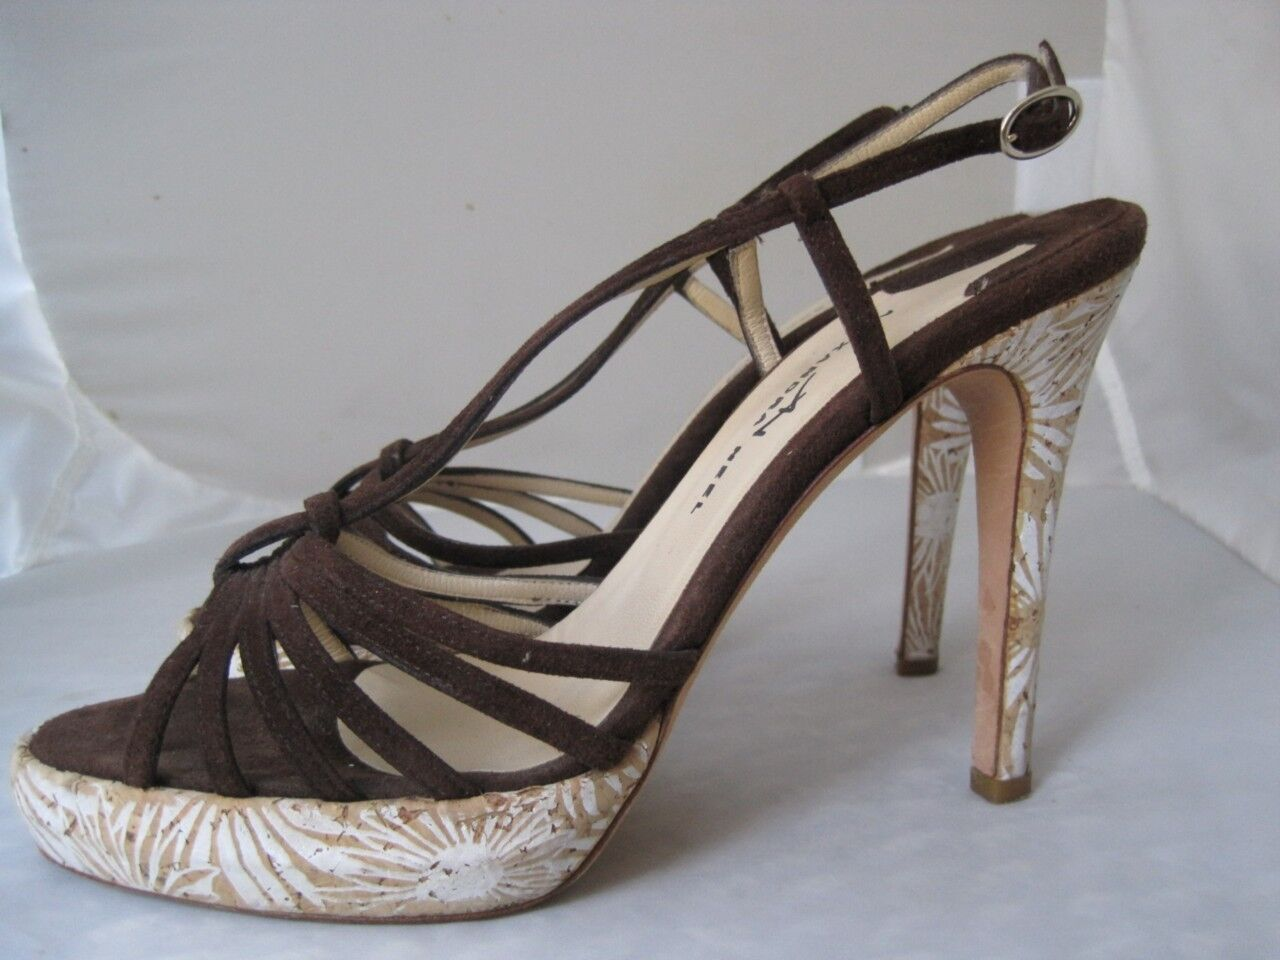 Alexandra Neel Painted Daises Cork Sandals braun 37.5